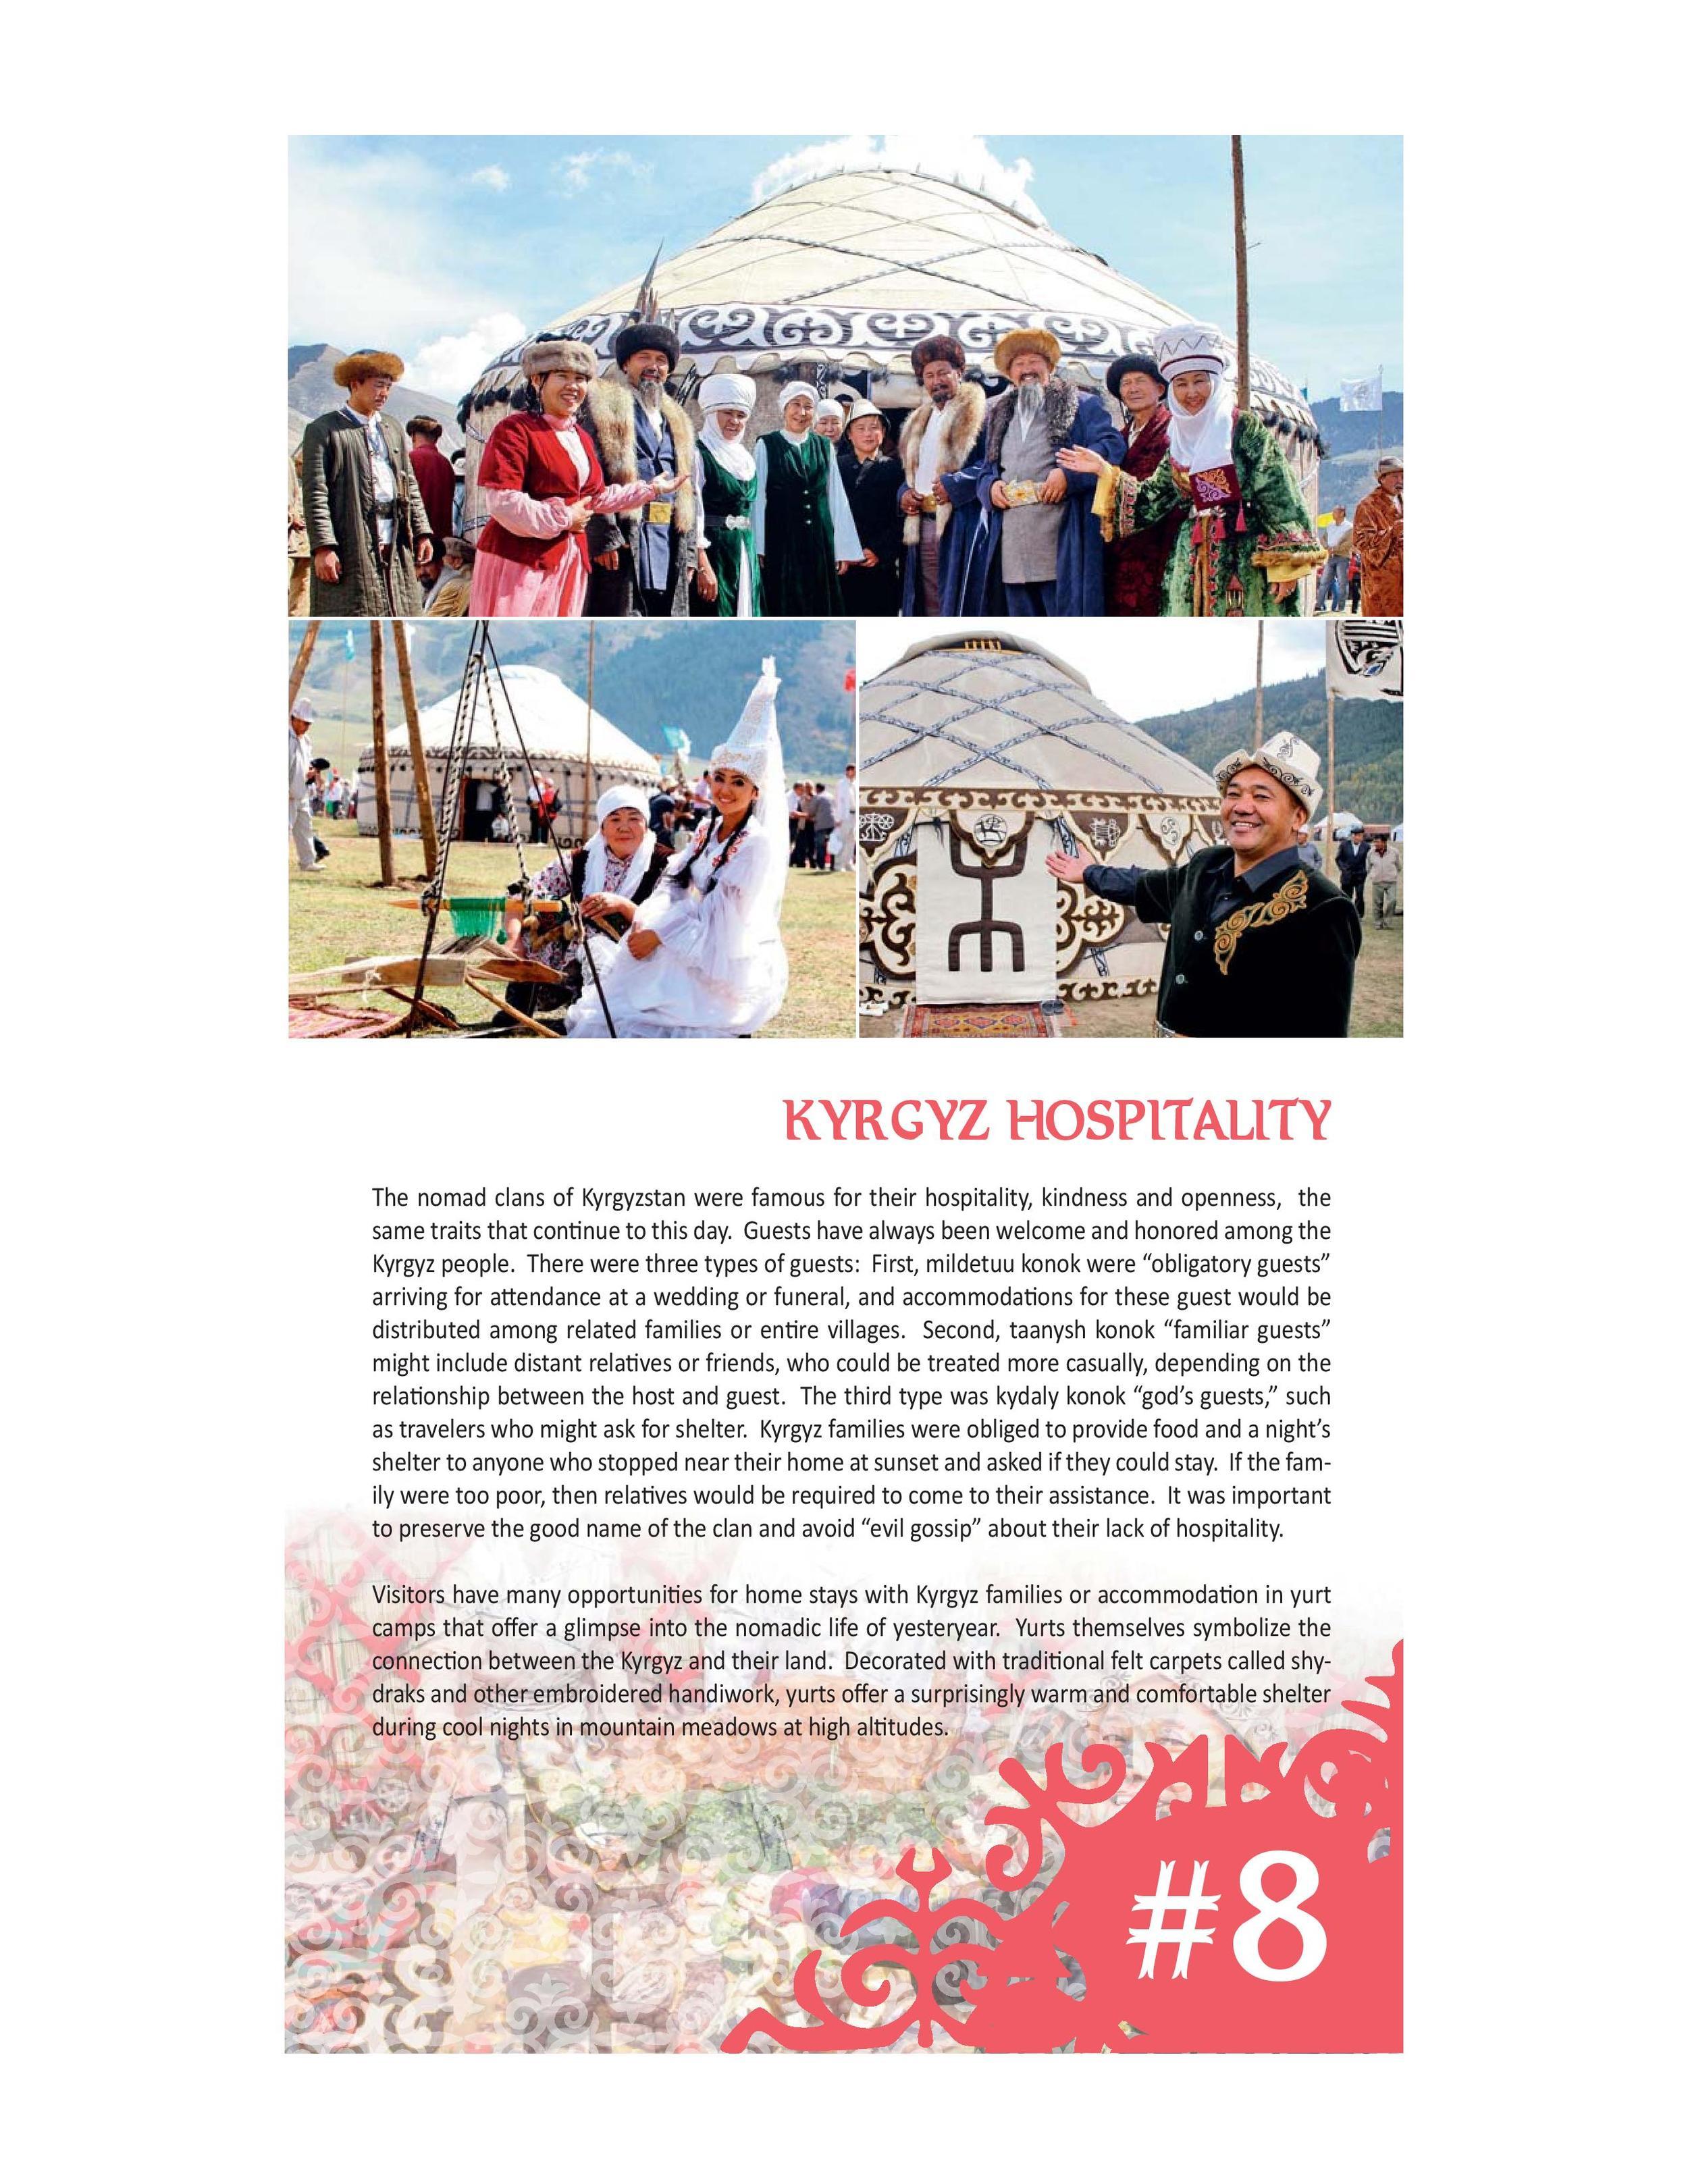 10 reasons to explore Kyrgyzstan_SMALL-page-009.jpg